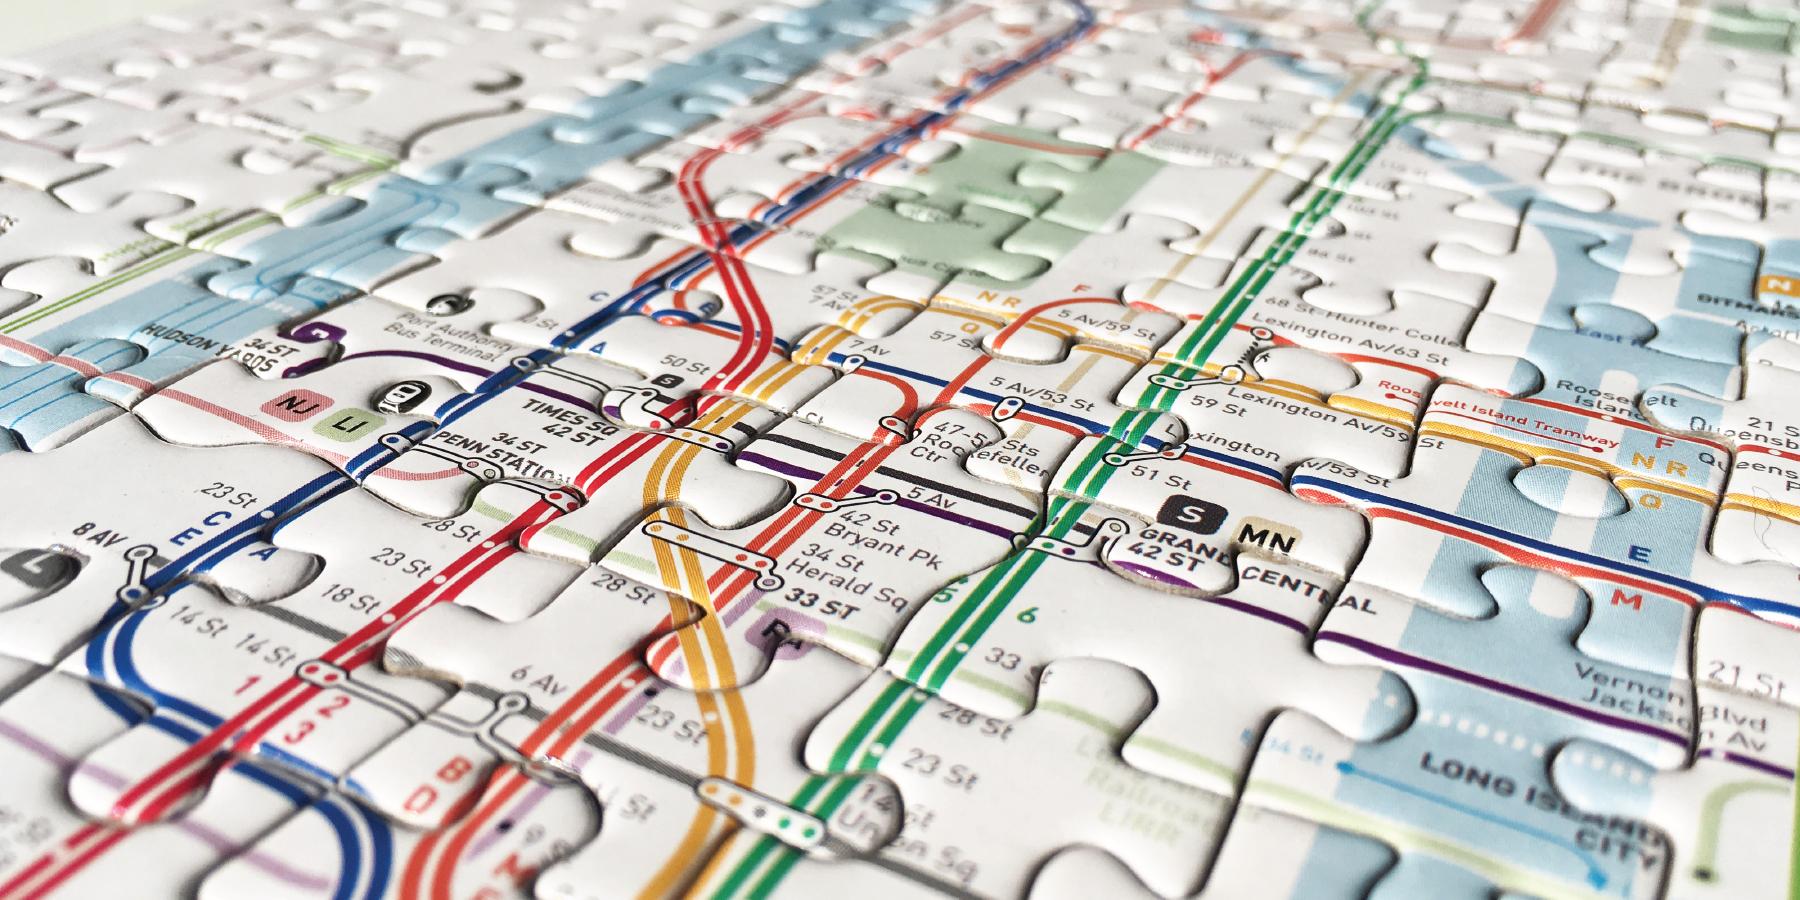 inat maps